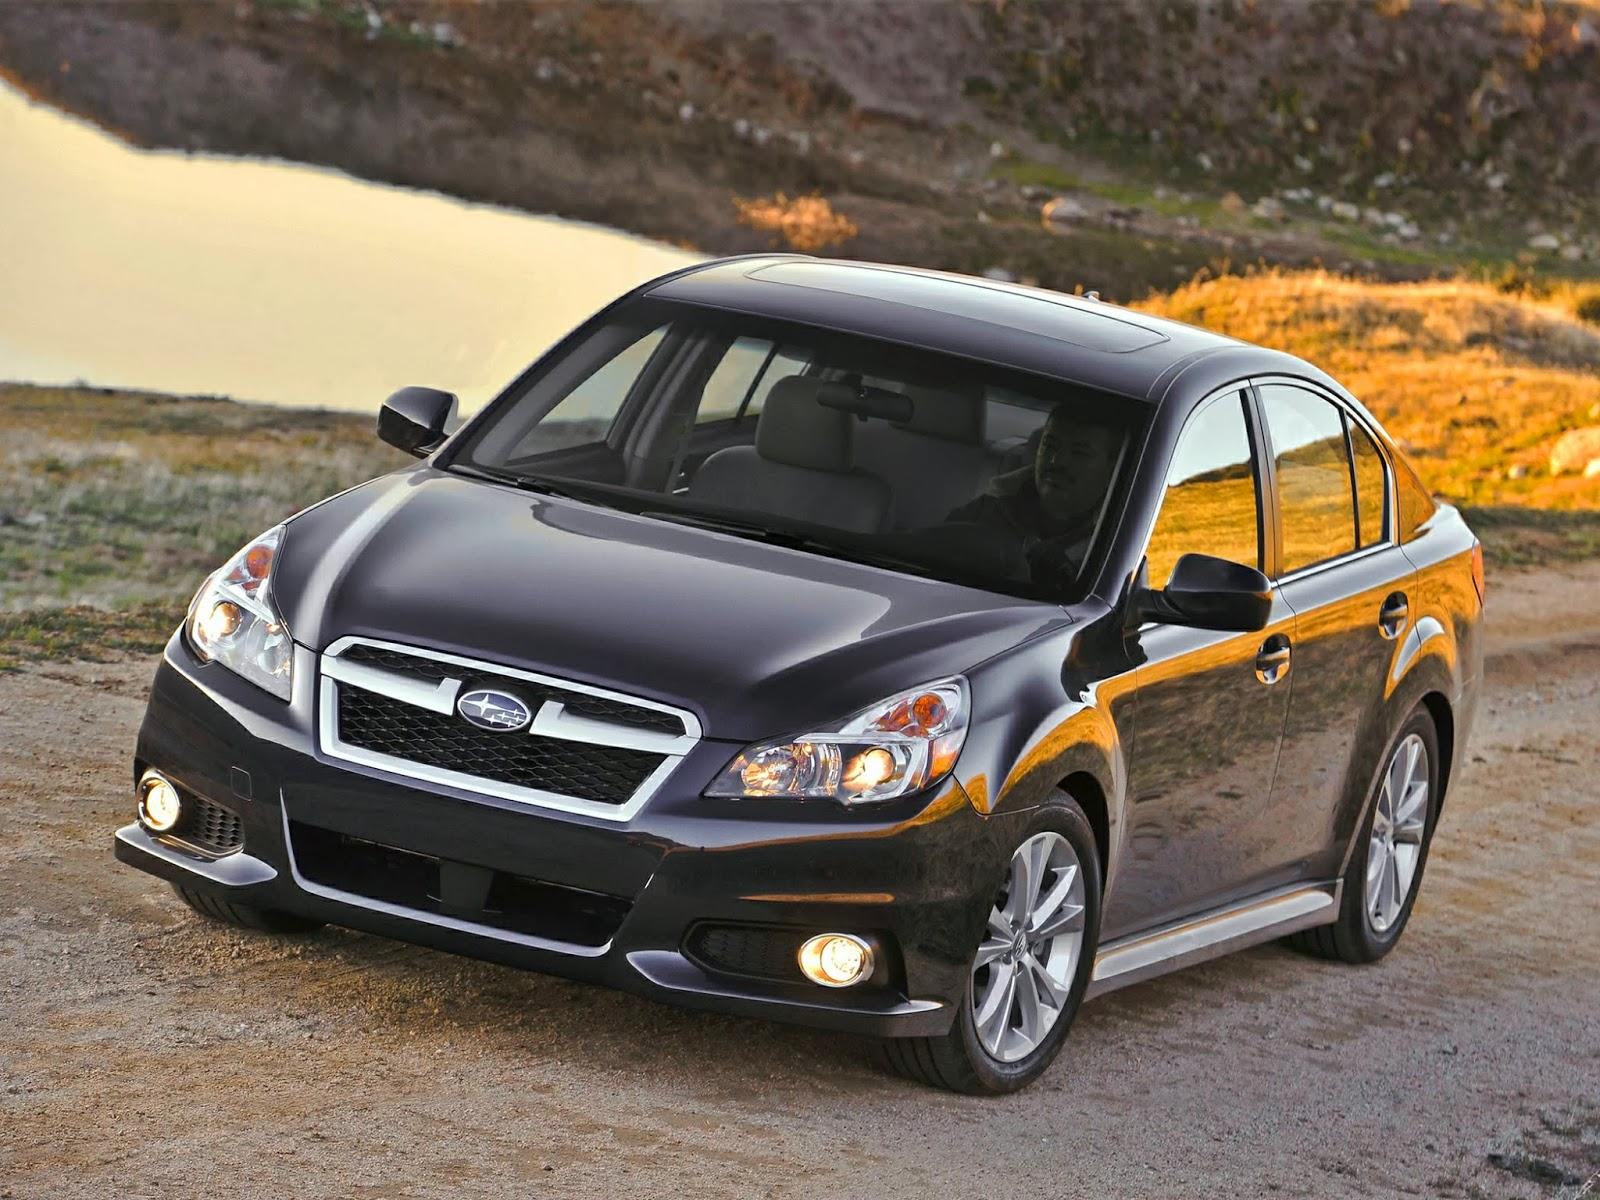 Subaru legacy, subaru legacy interior, subaru legacy